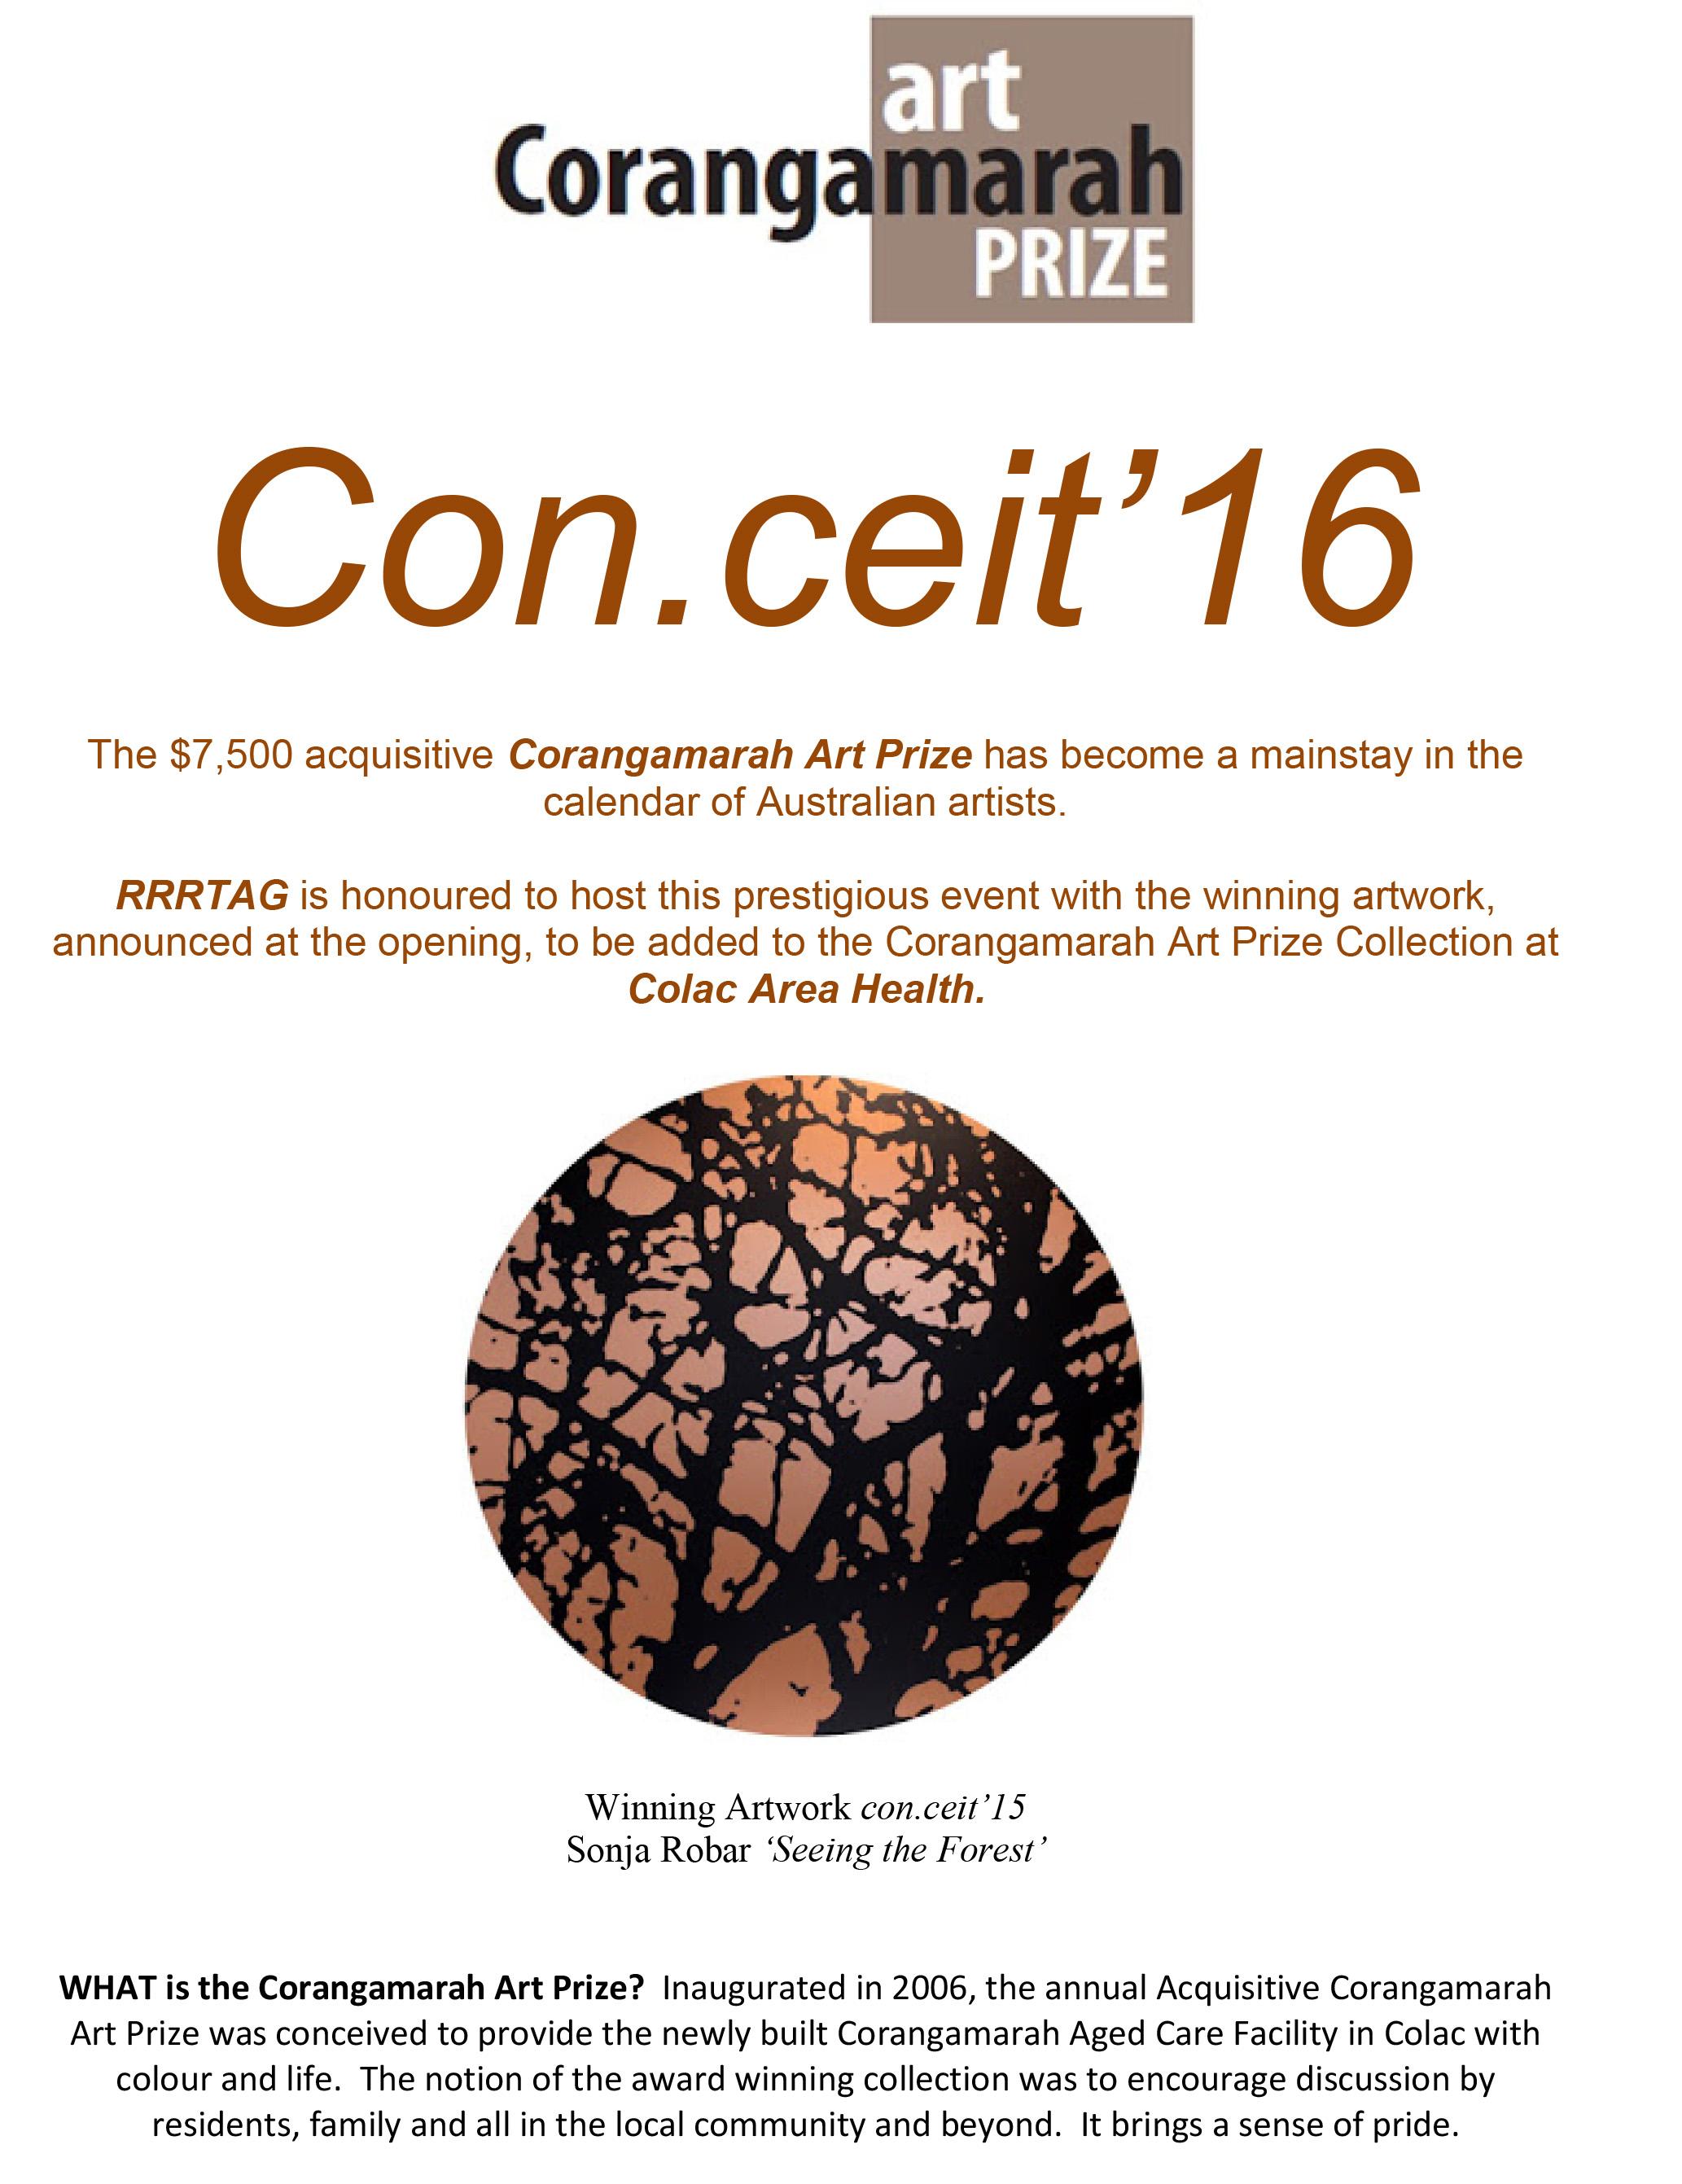 Corangamarah Art Prize.jpg